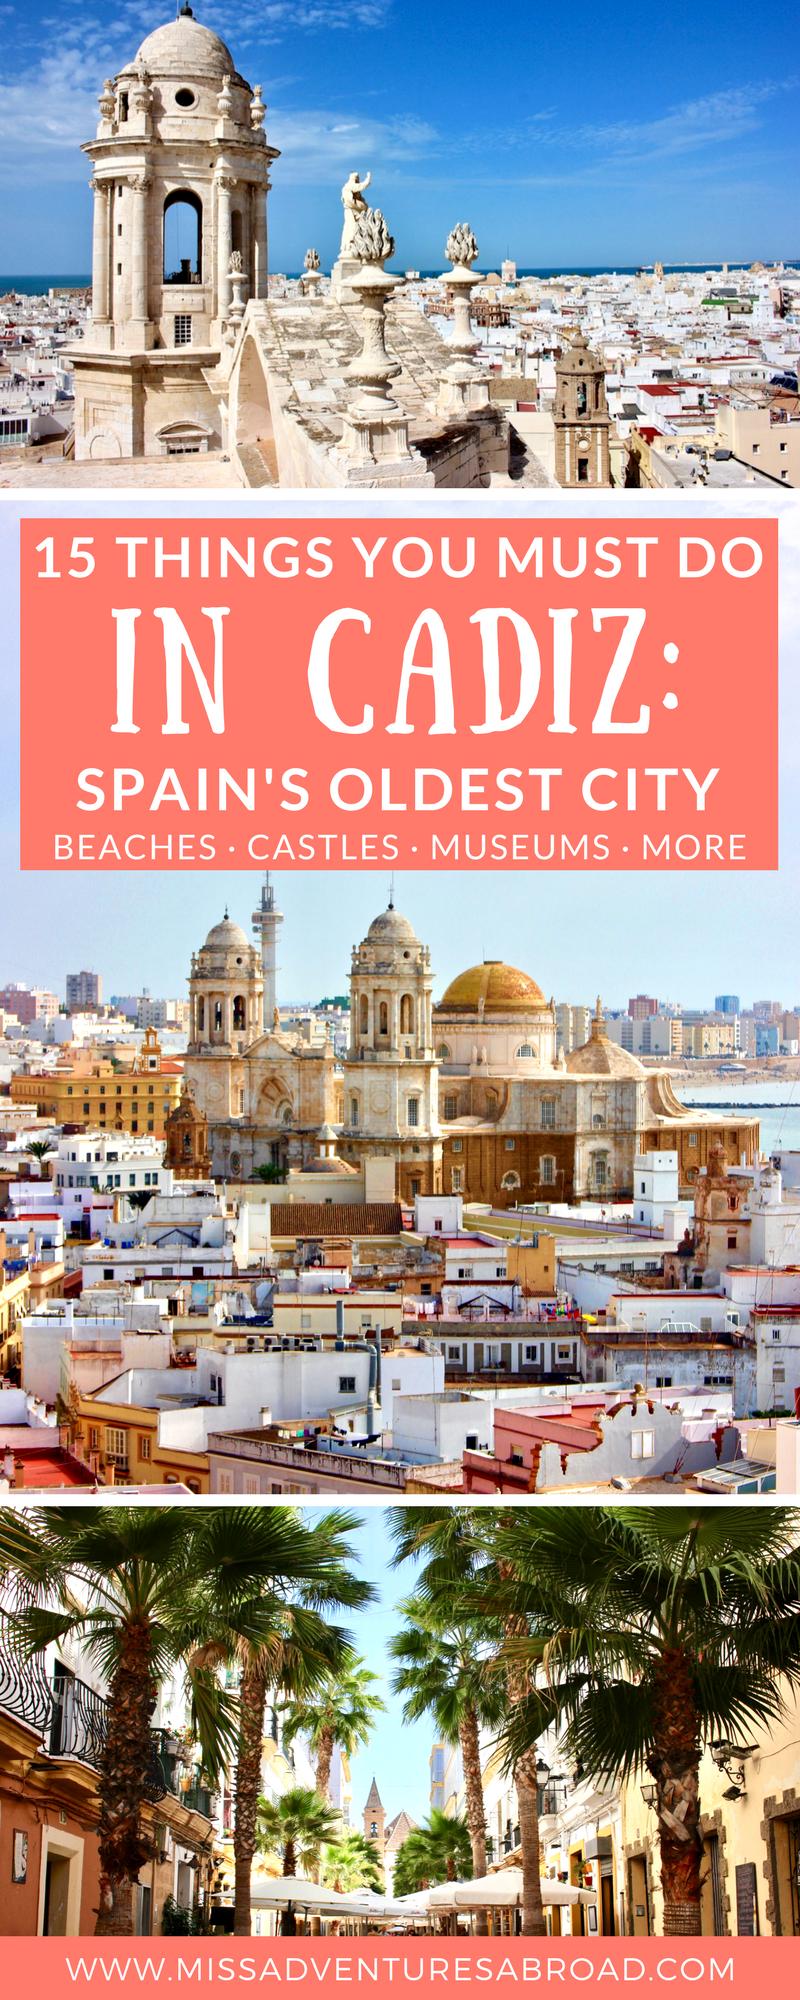 15 Cool Things To Do In Cádiz: Spain's Oldest City #spanishthings